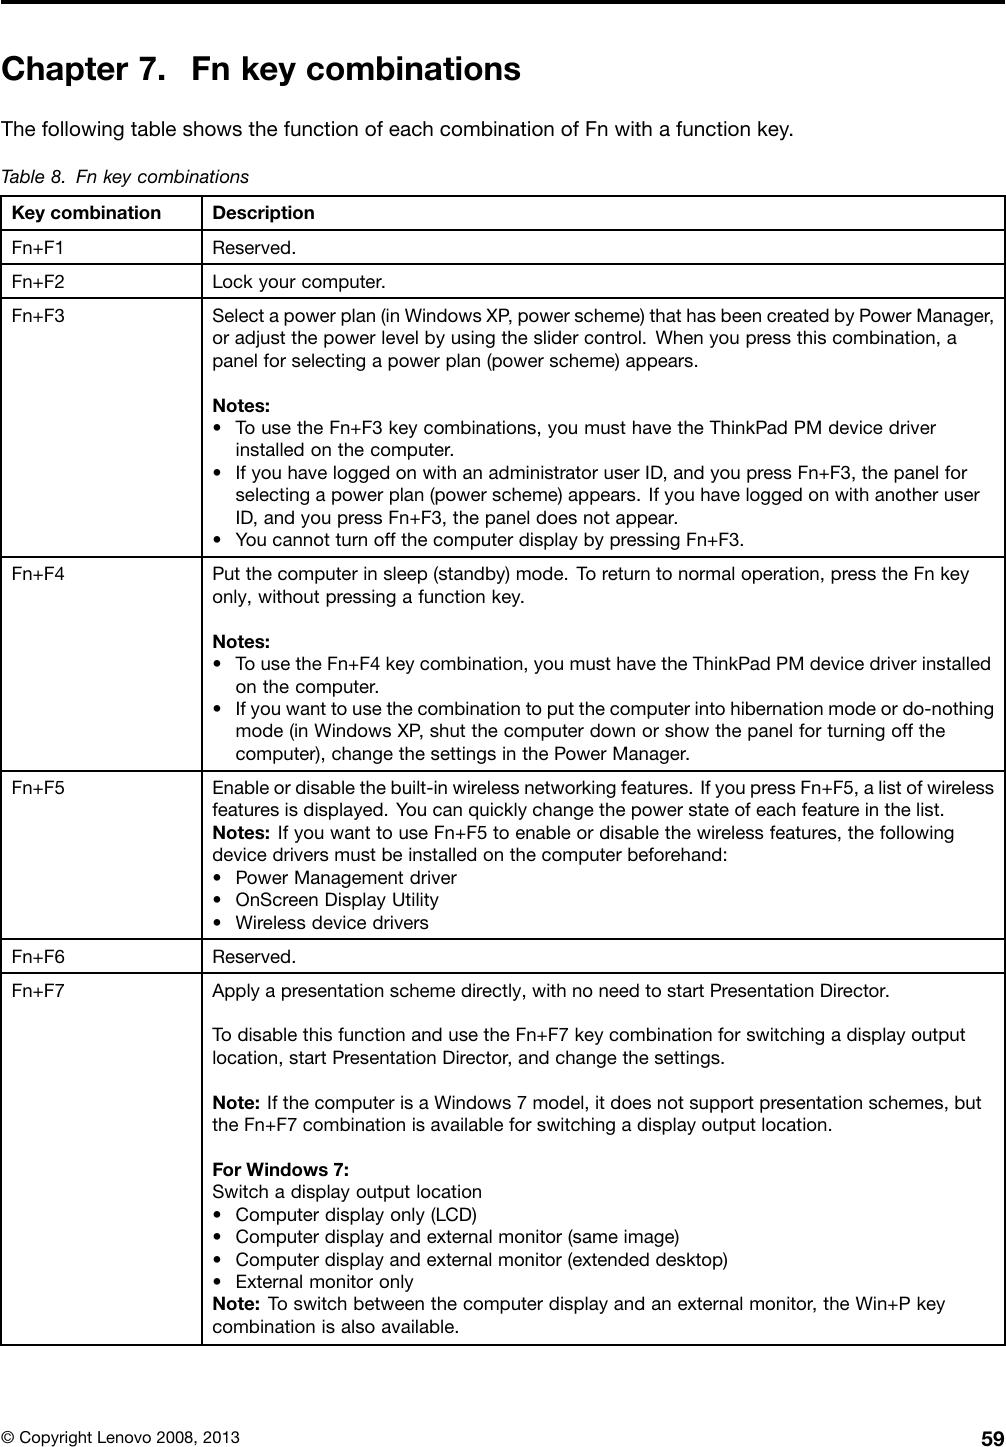 Lenovo Thinkpad 2758Mxu Users Manual